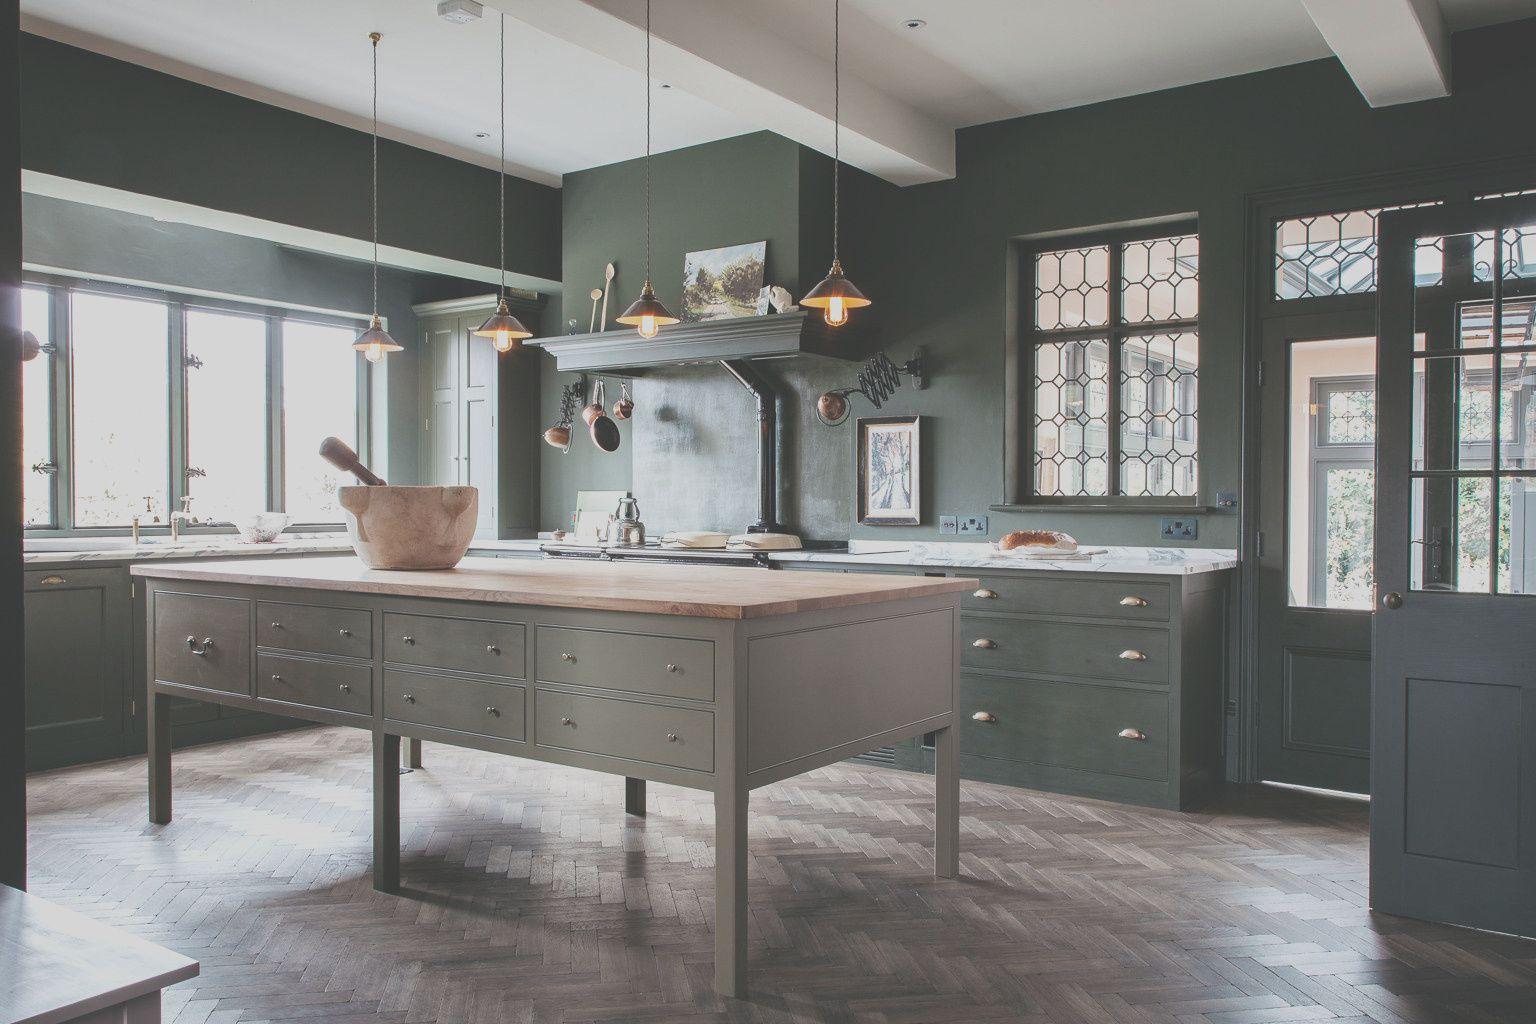 12 Regular Kitchen New Design Image In 2020 Plain English Kitchen English Country Kitchens New Kitchen Designs